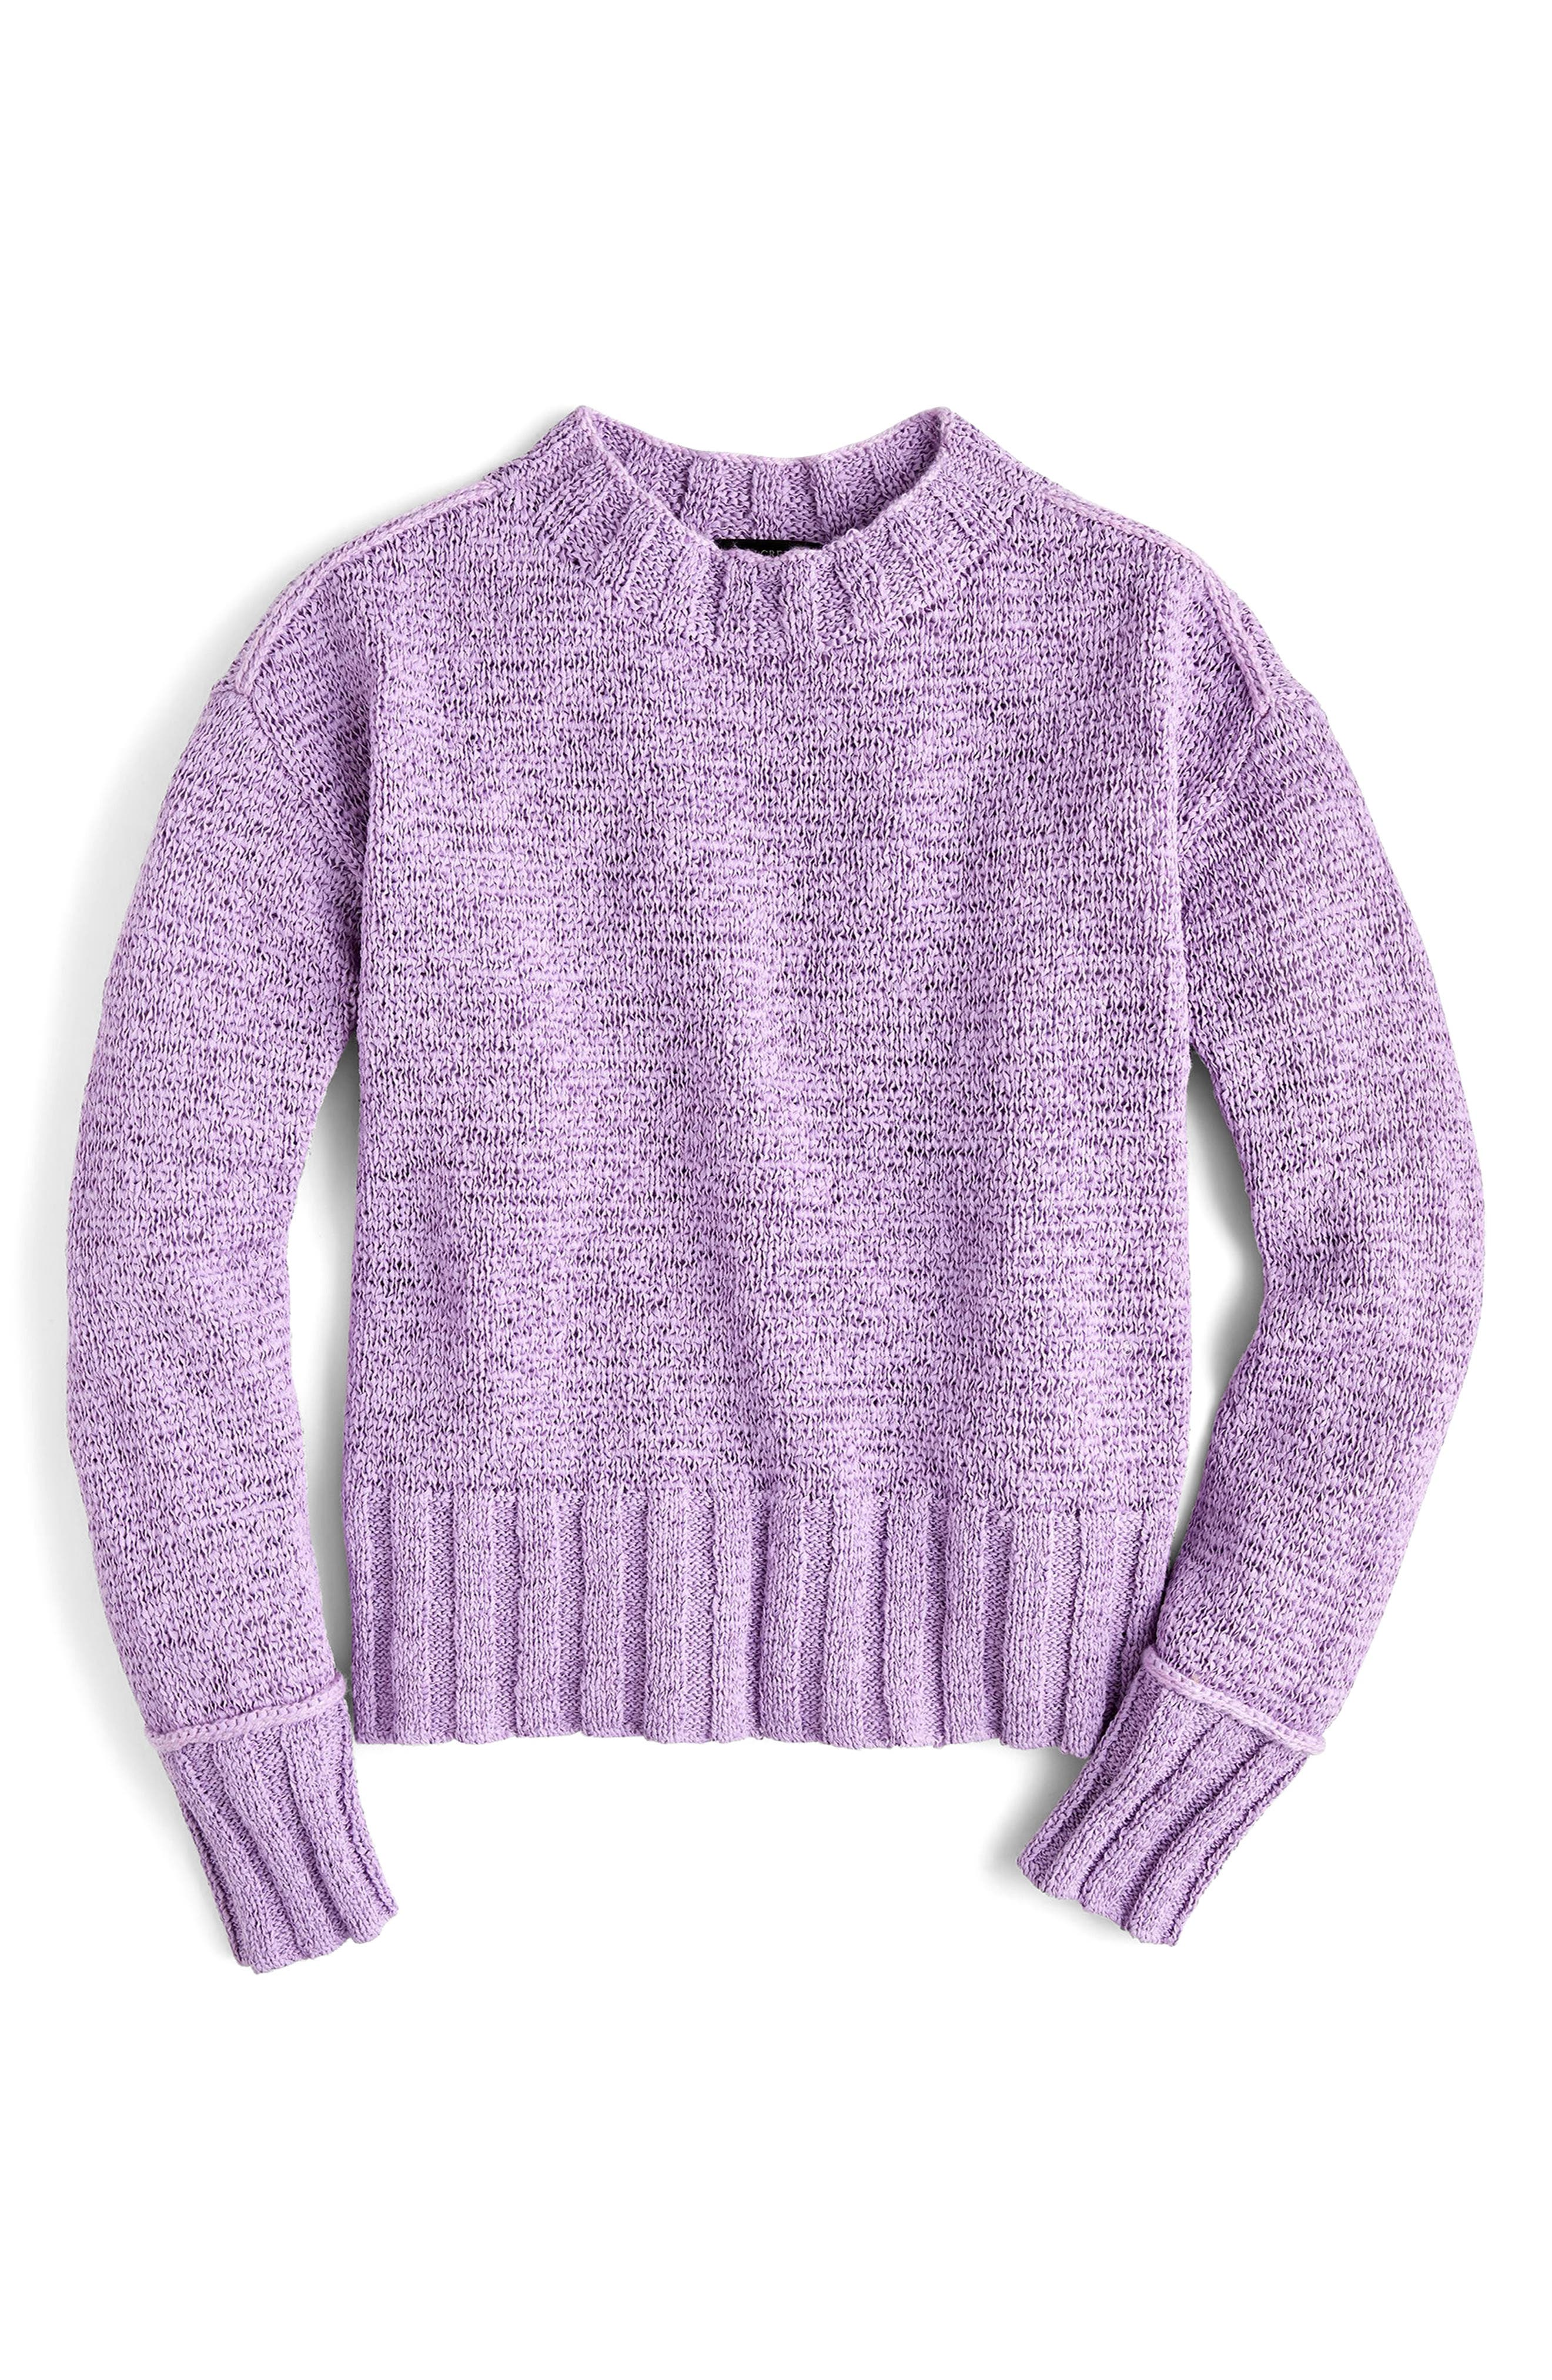 Erica Heathered Cotton Wide Rib Crewneck Sweater,                         Main,                         color, Faded Lavender